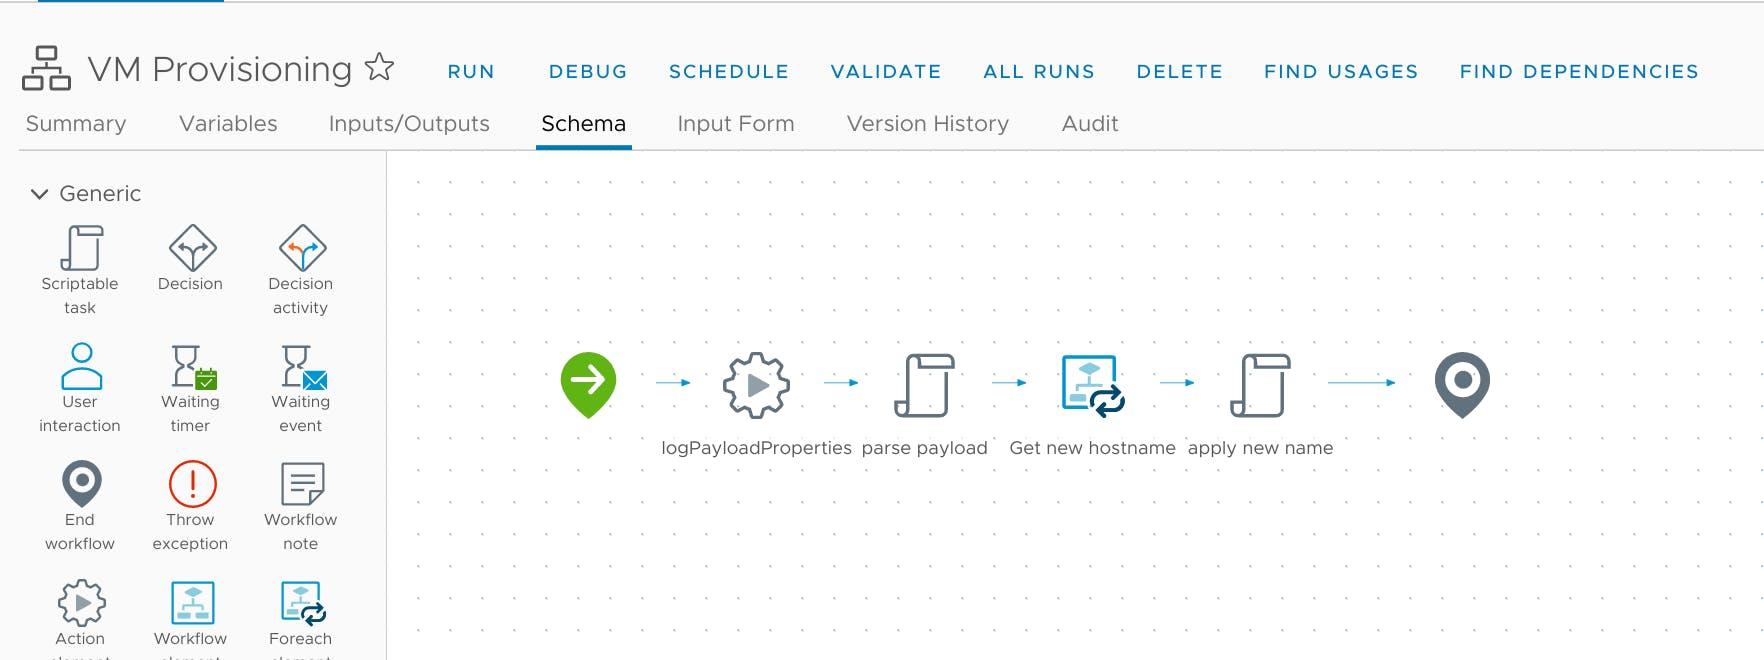 Workflow: VM Provisioning